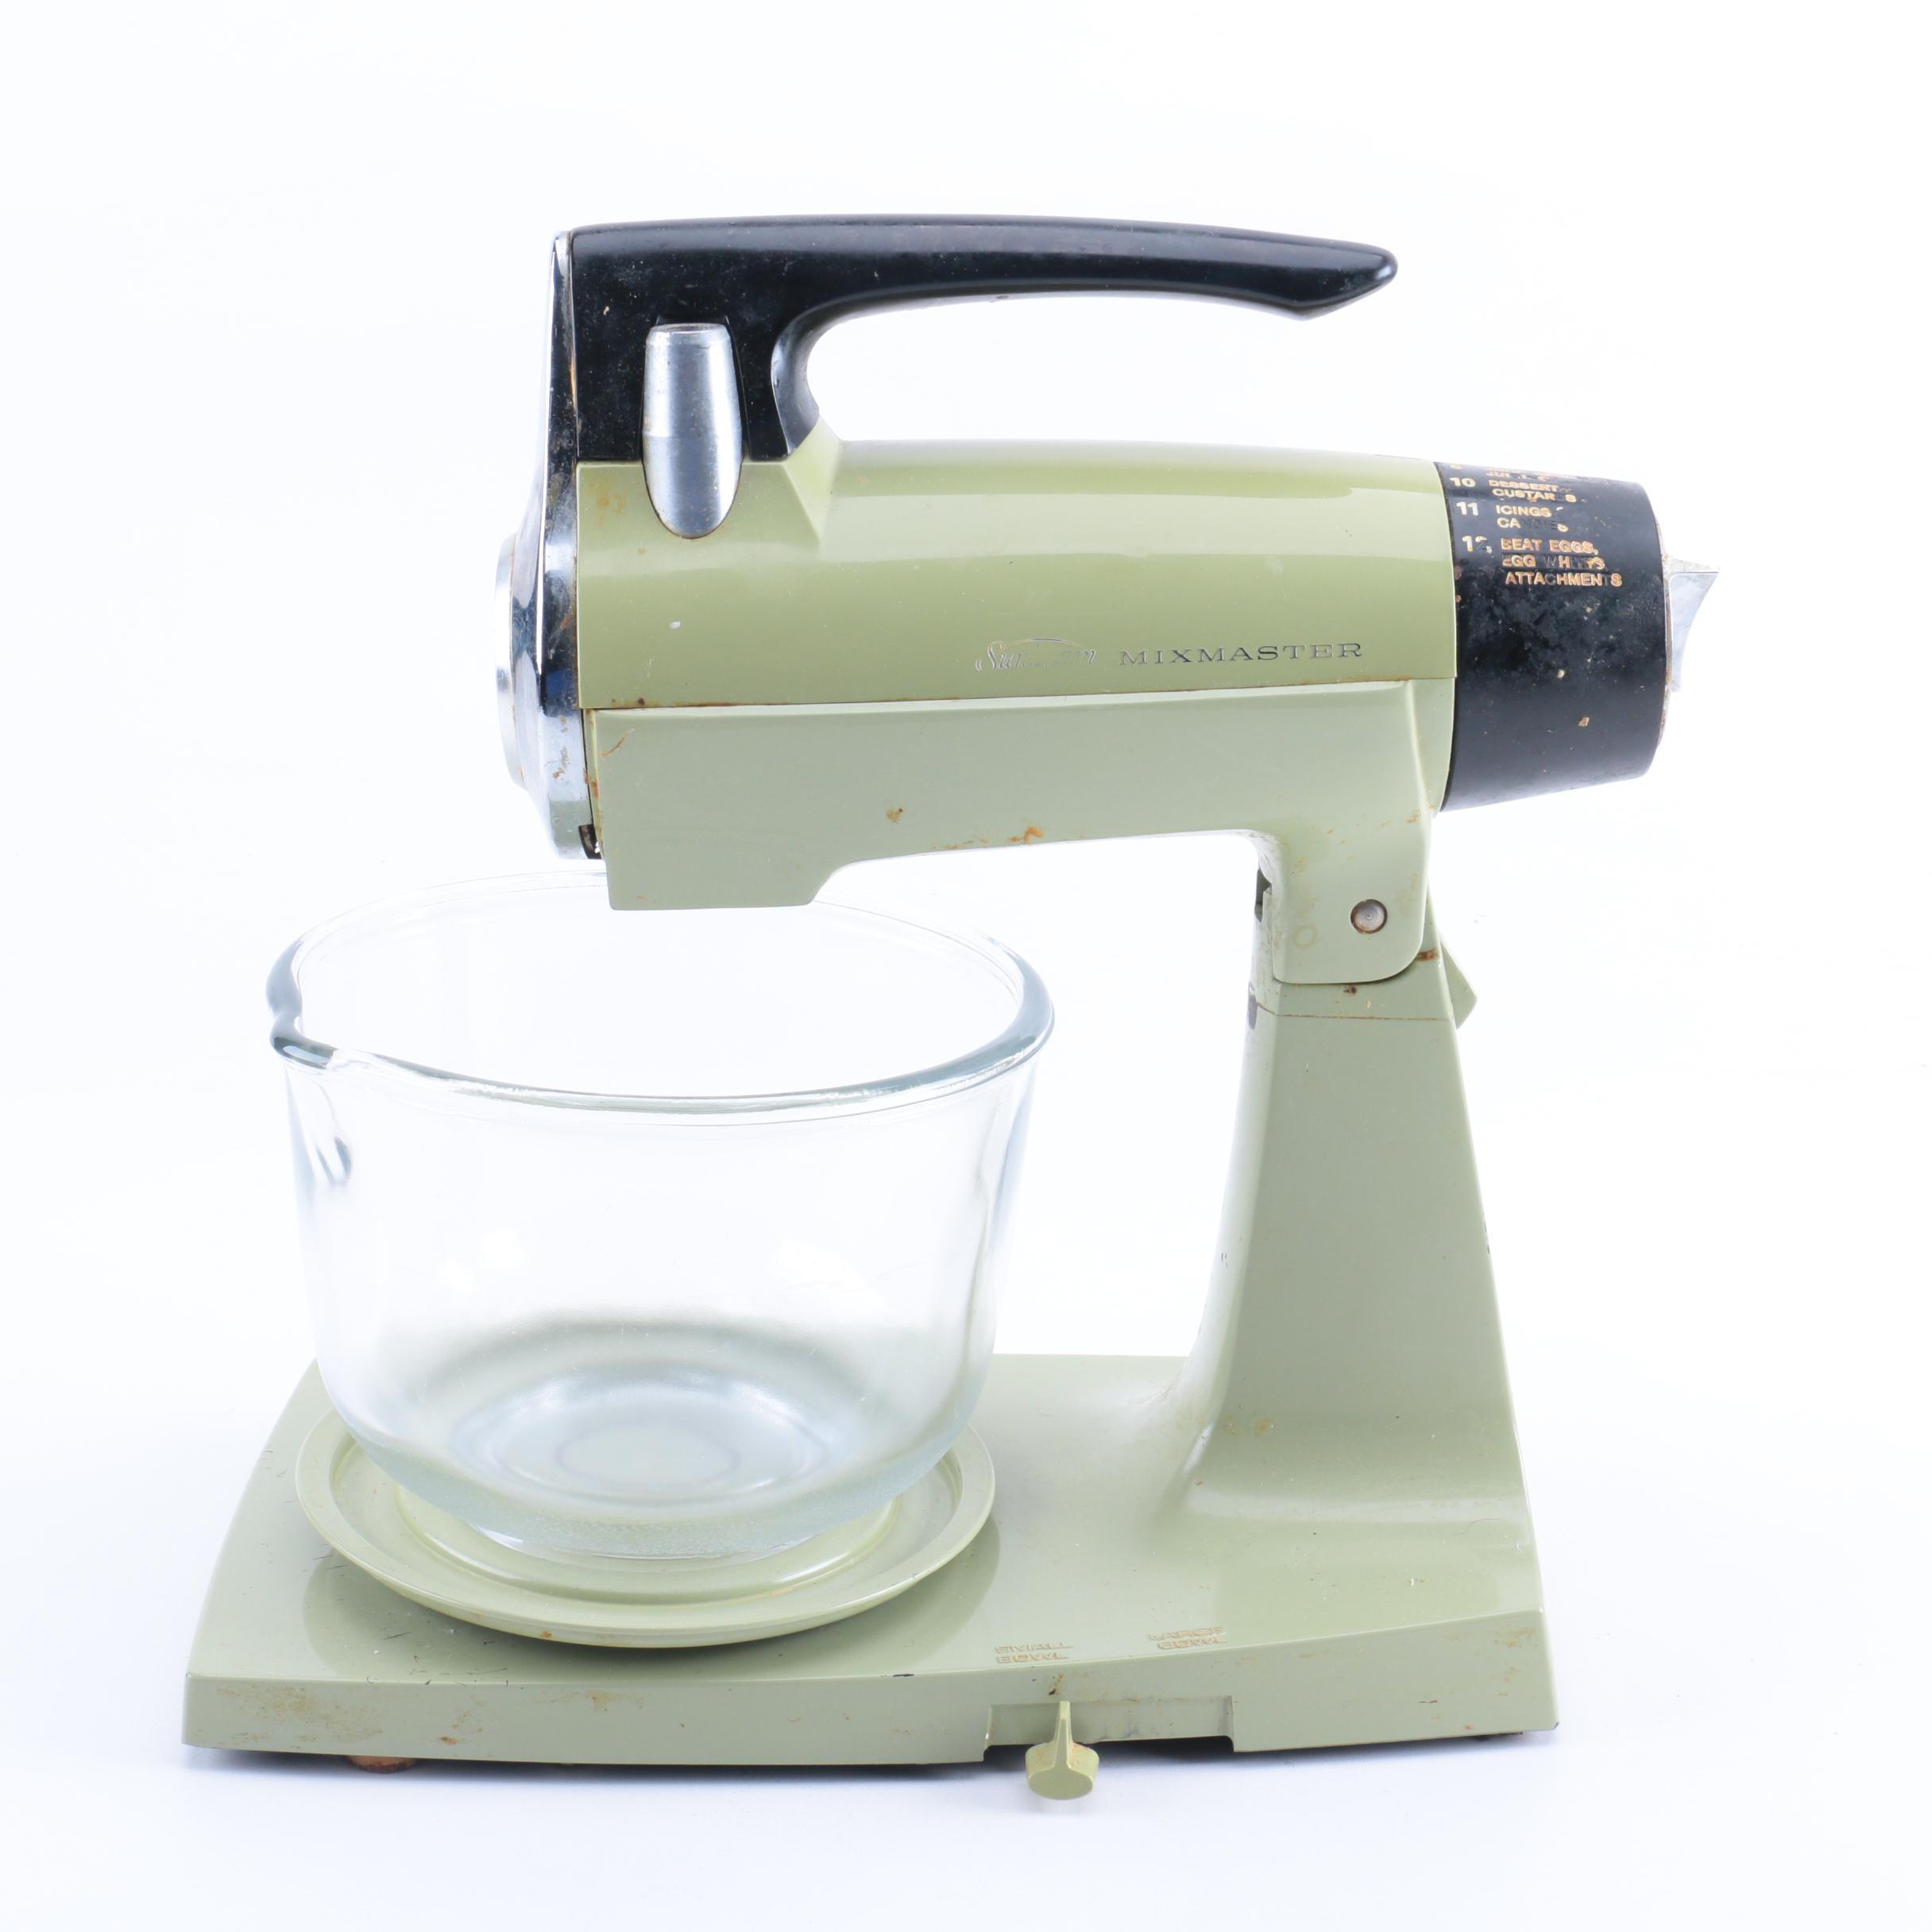 sunbeam   mixmaster   stand mixer vintage kitchen appliances auctions   used kitchen appliances in      rh   ebth com